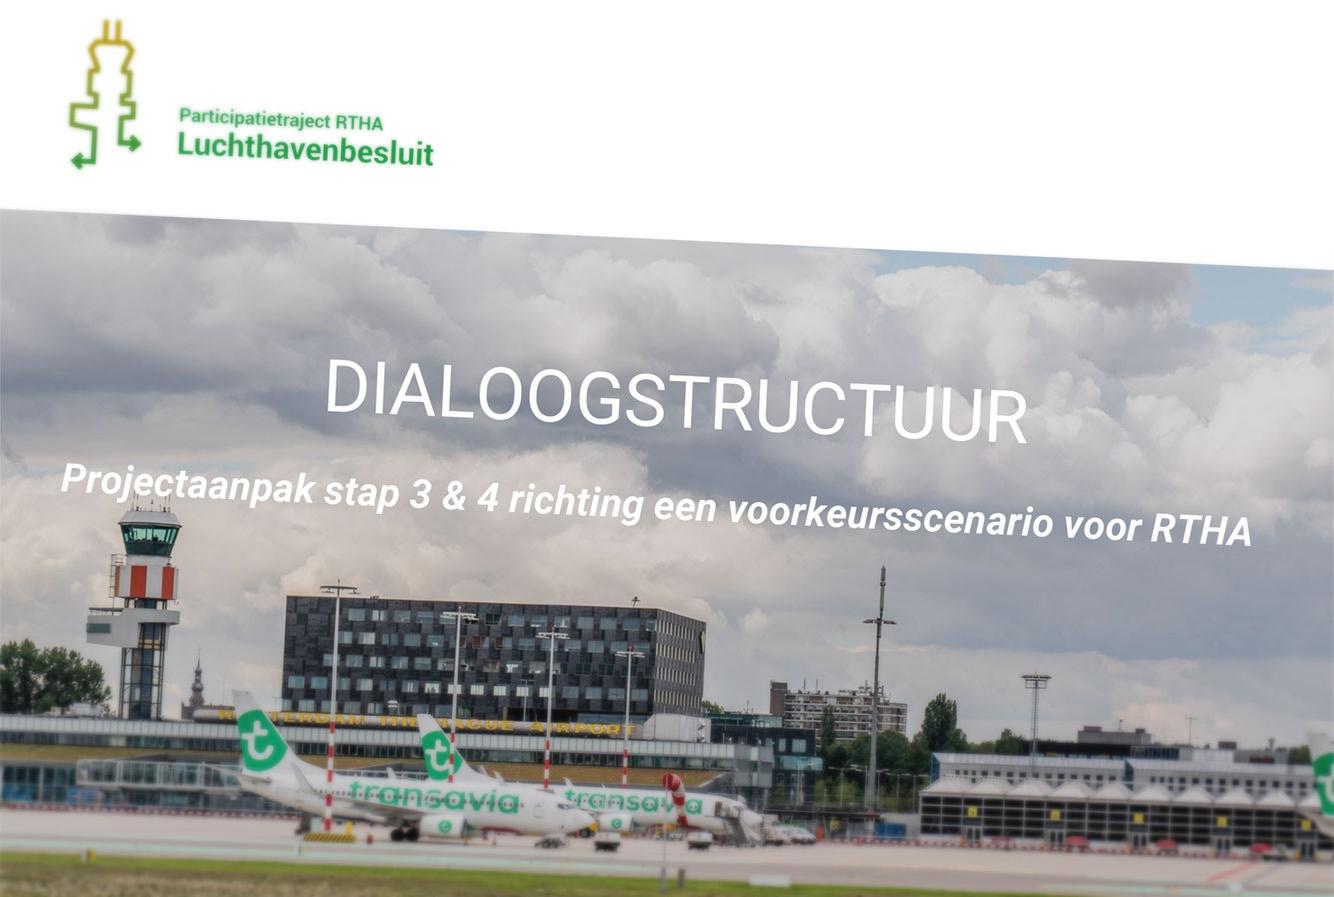 Projectaanpak Dialoogstructuur stap 3 & 4 LHB RTHA